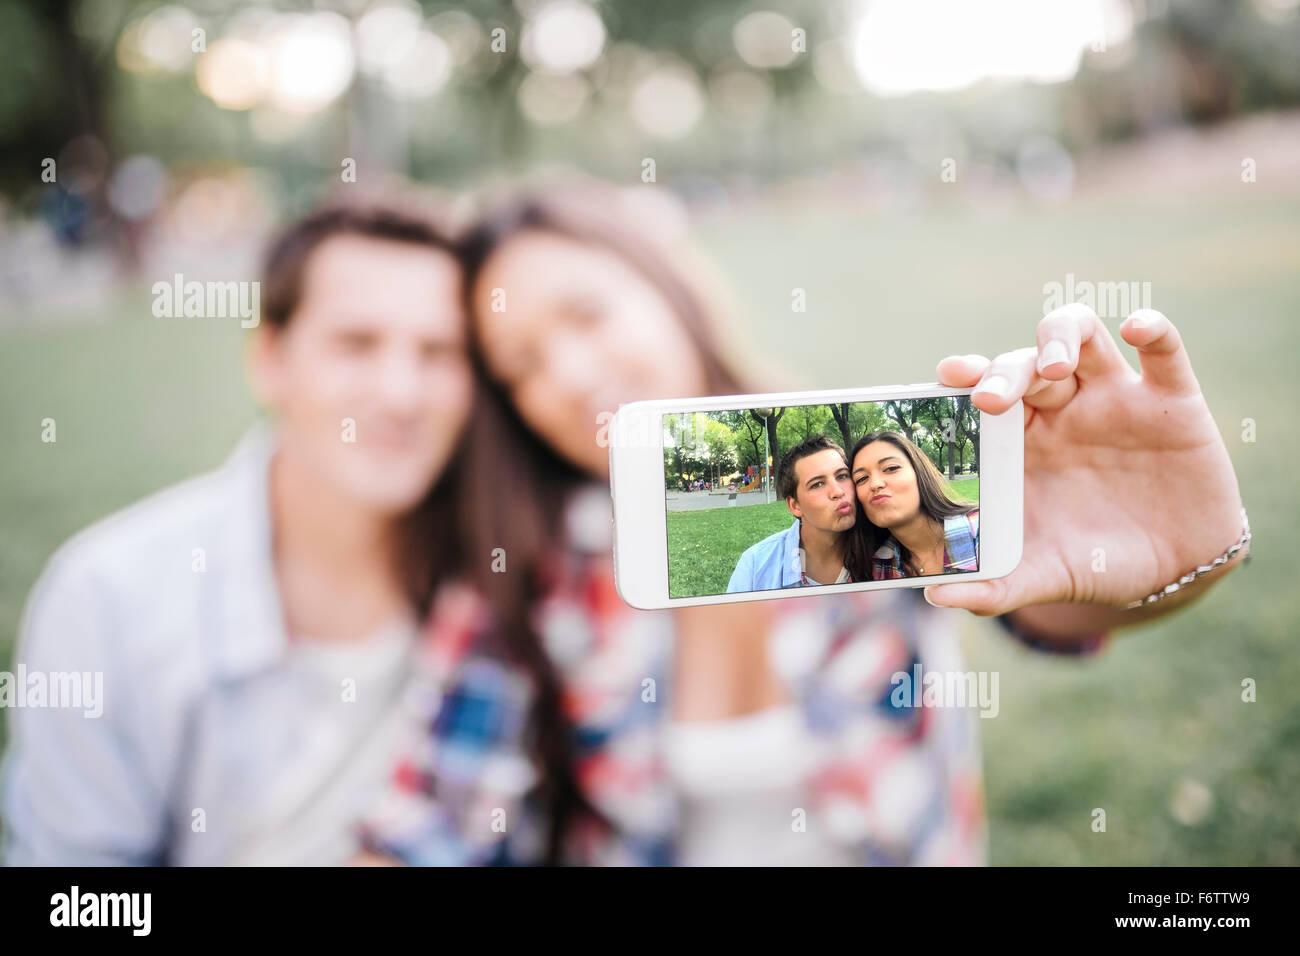 La foto en la pantalla de un smartphone de pareja joven en el amor Imagen De Stock